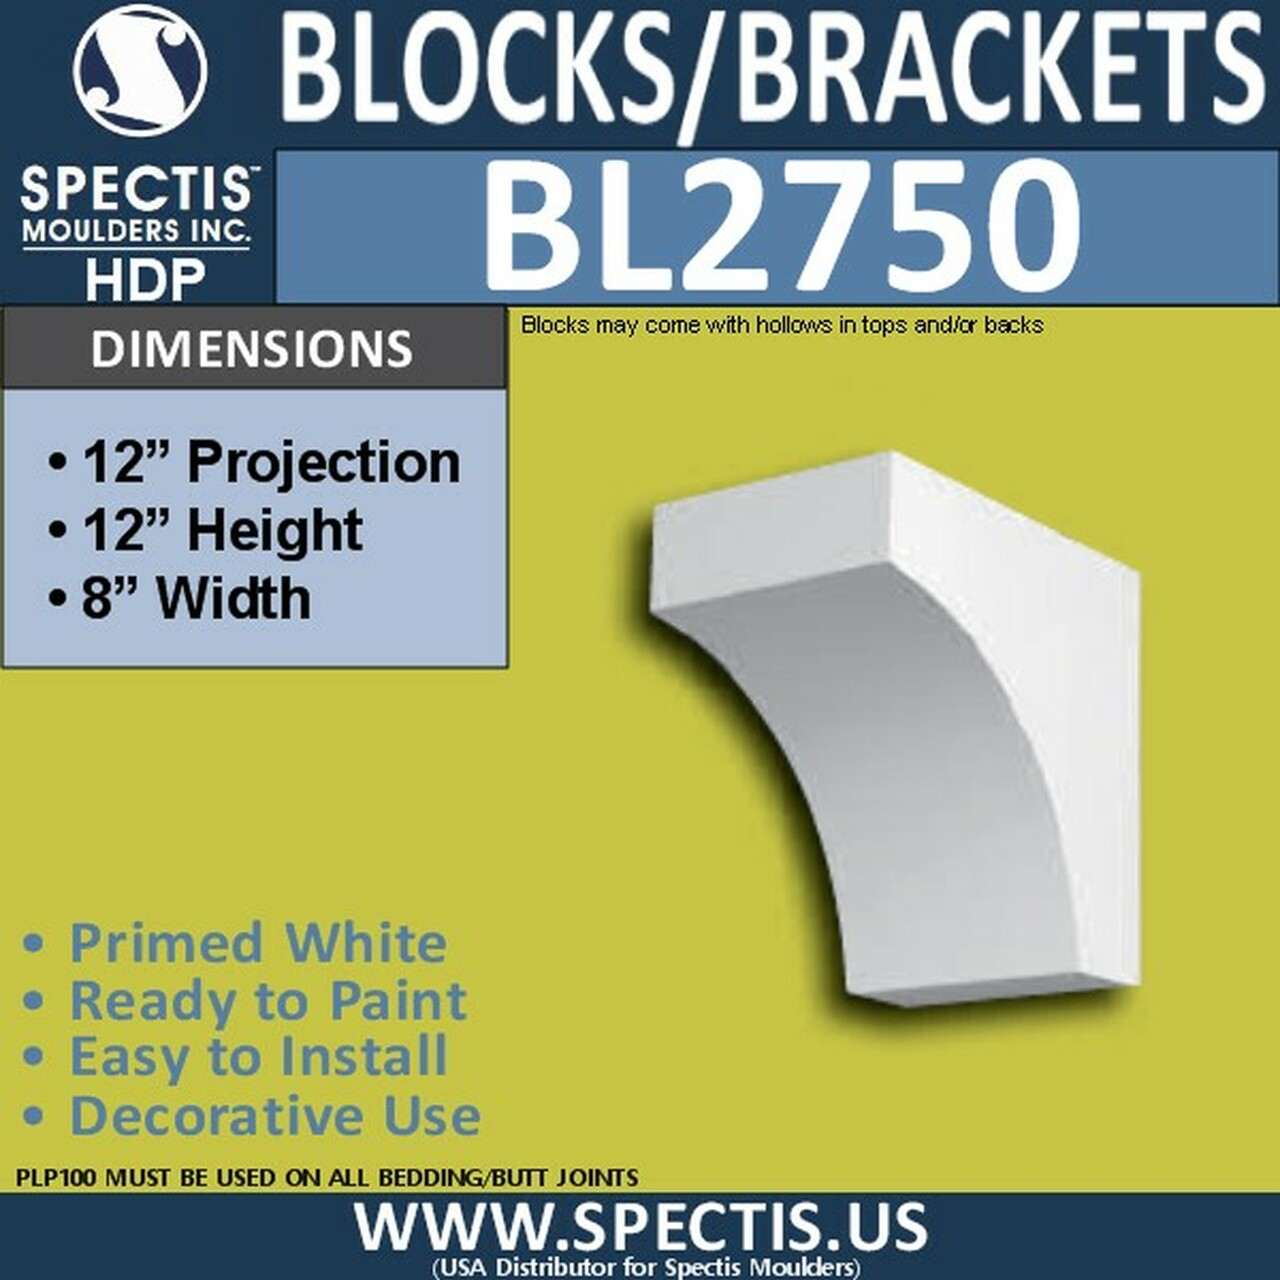 "BL2750 Eave Block or Bracket 8""W x 12""H x 12"" P"